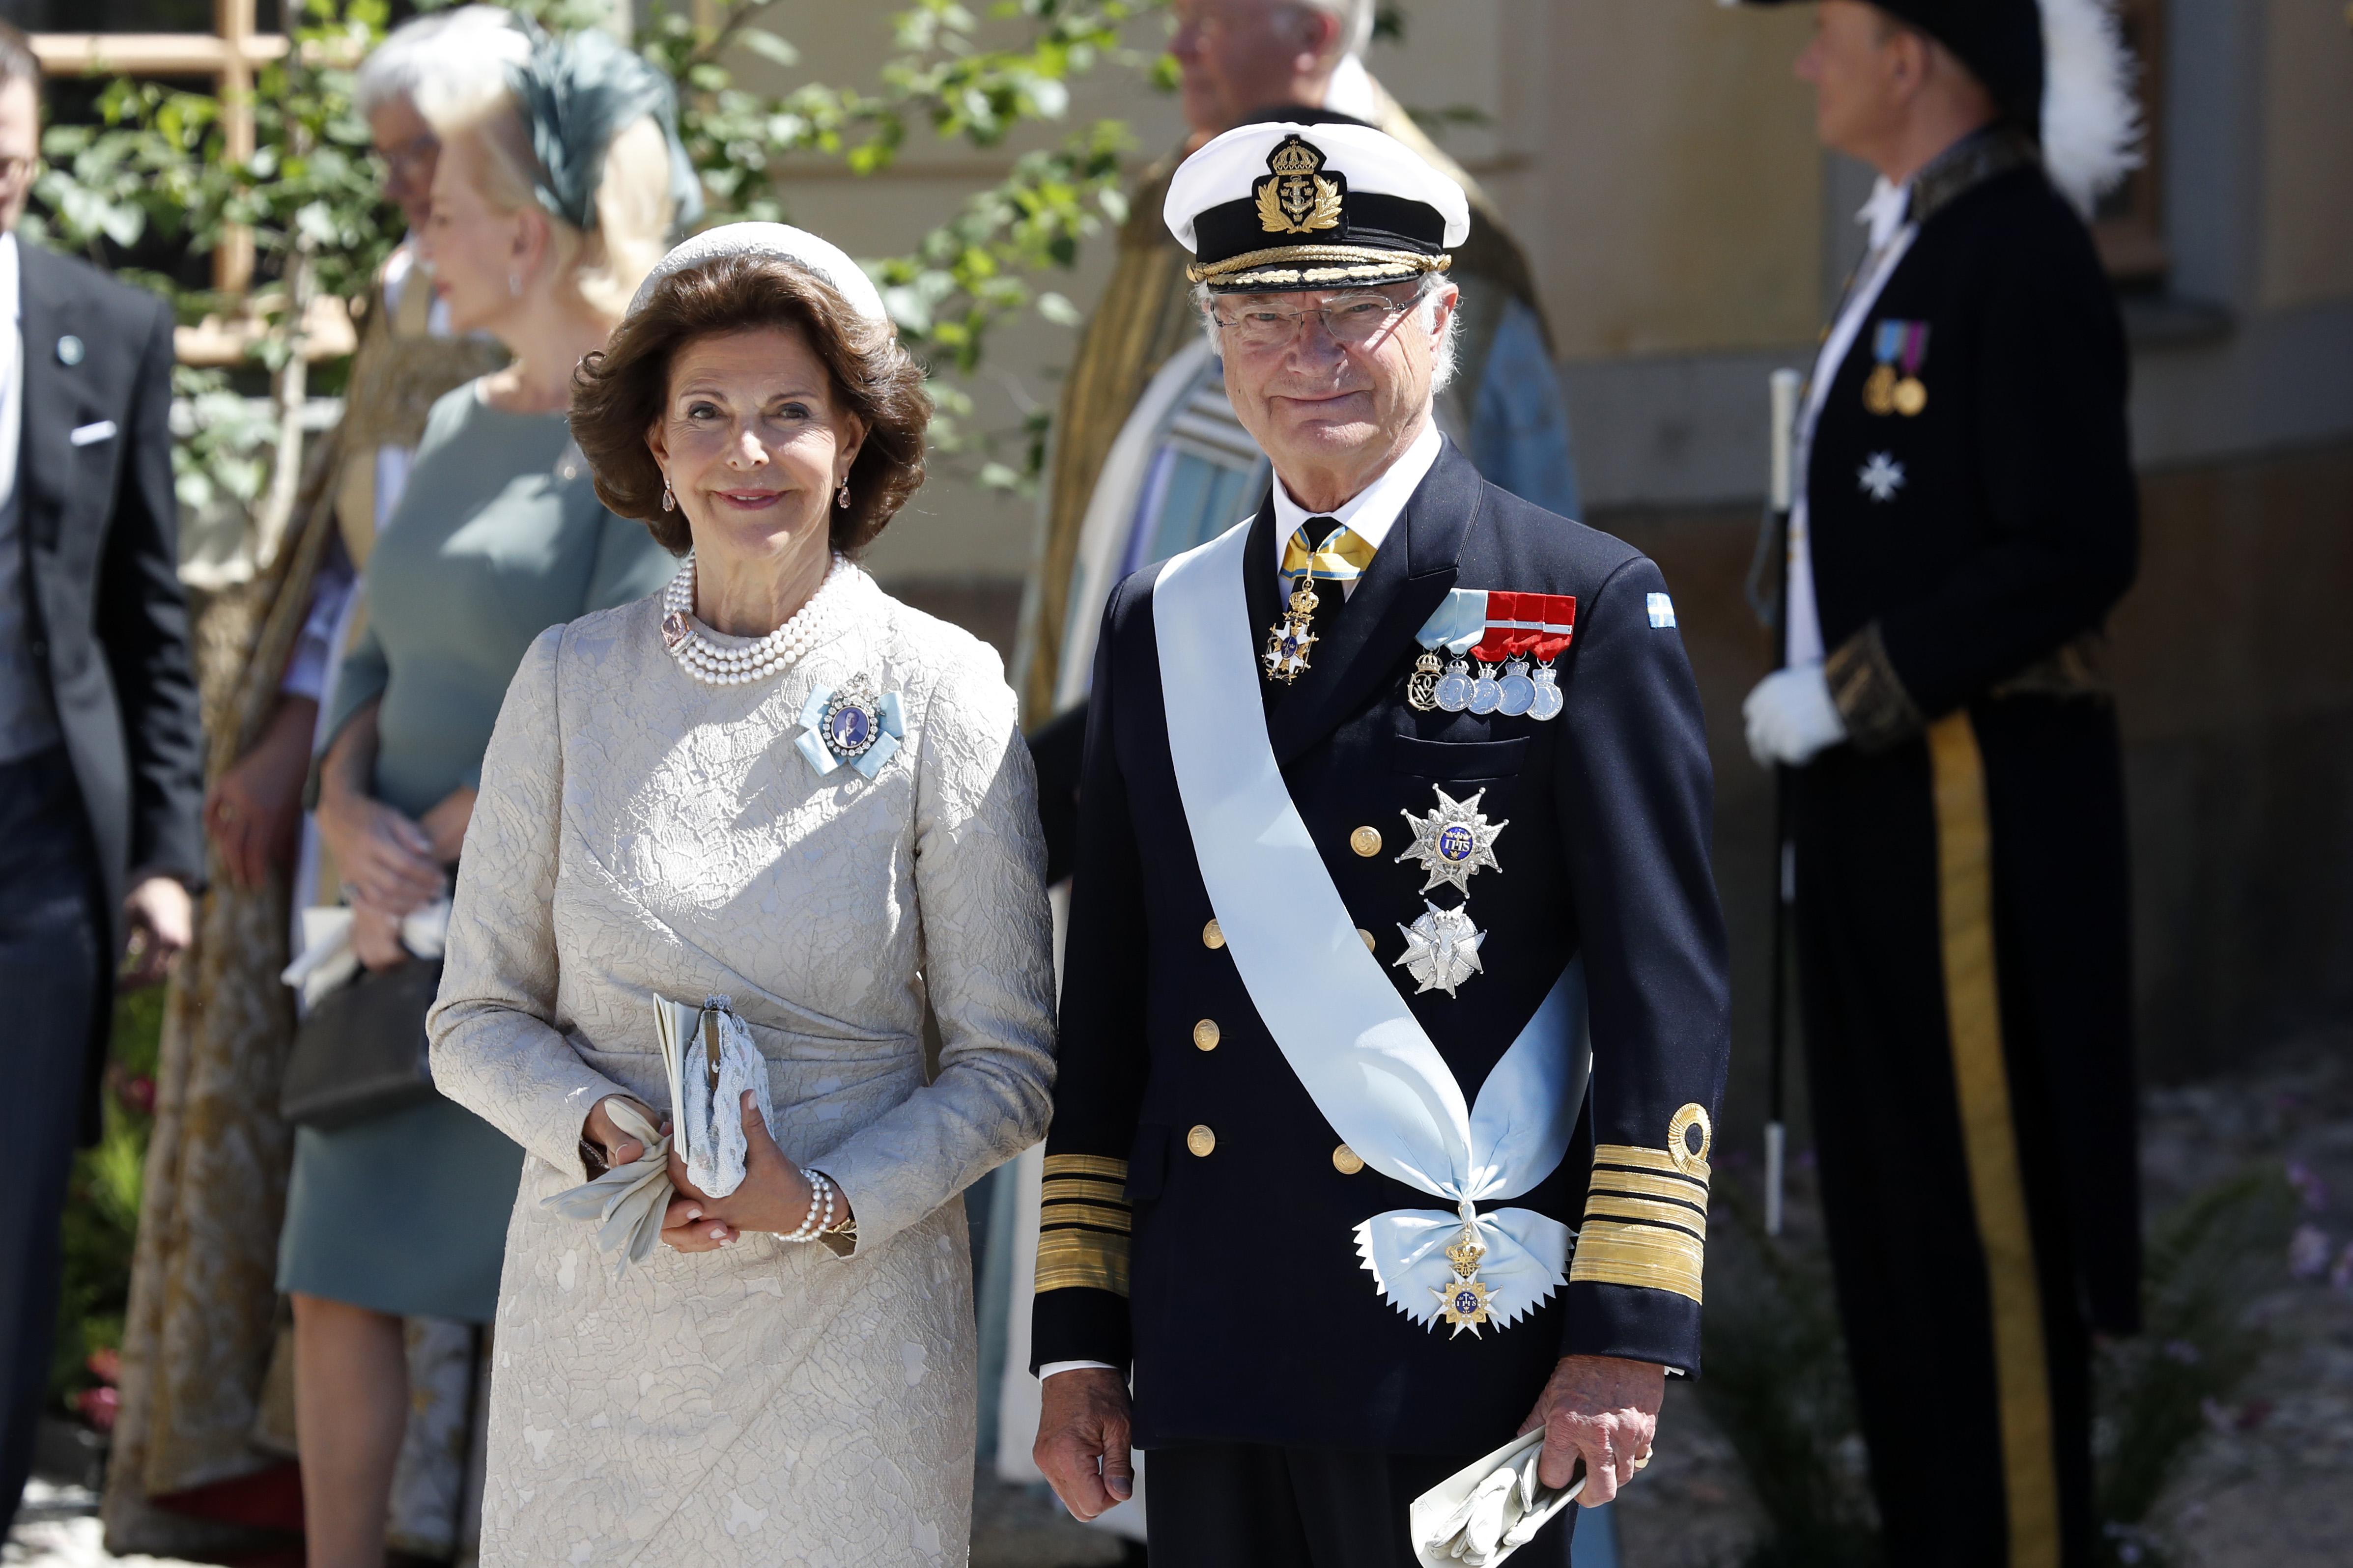 Rainha Silvia e Rei Carl XVI Gustaf da Suécia